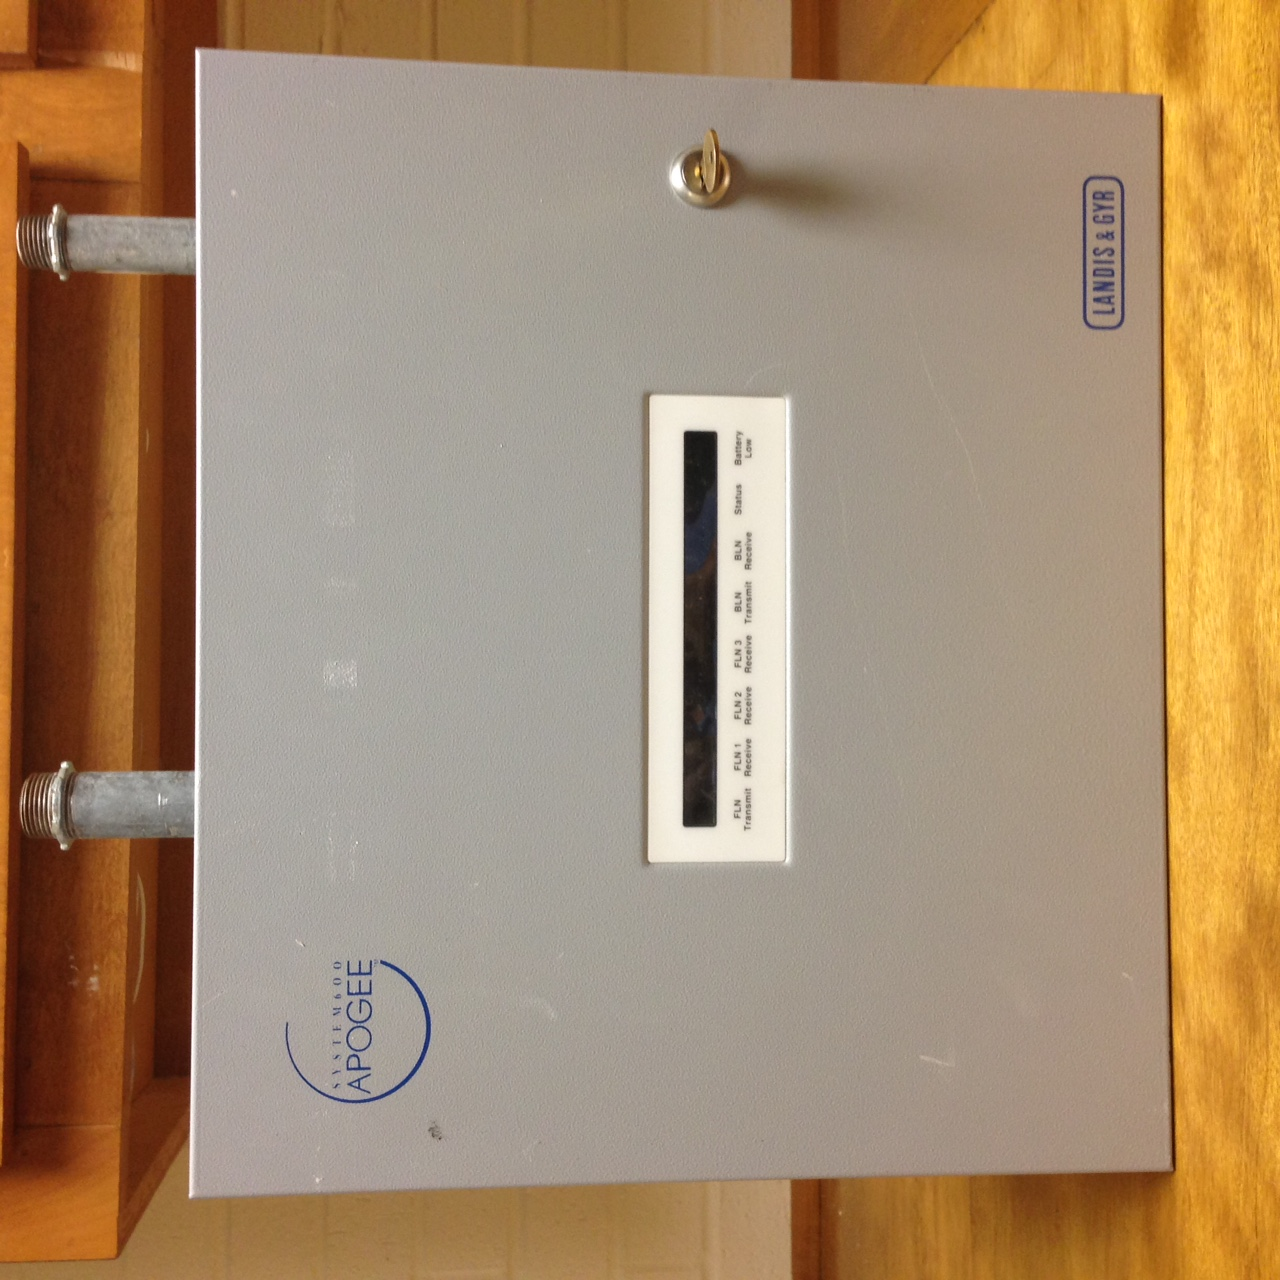 Siemens FLNC 544-442 & 545-791